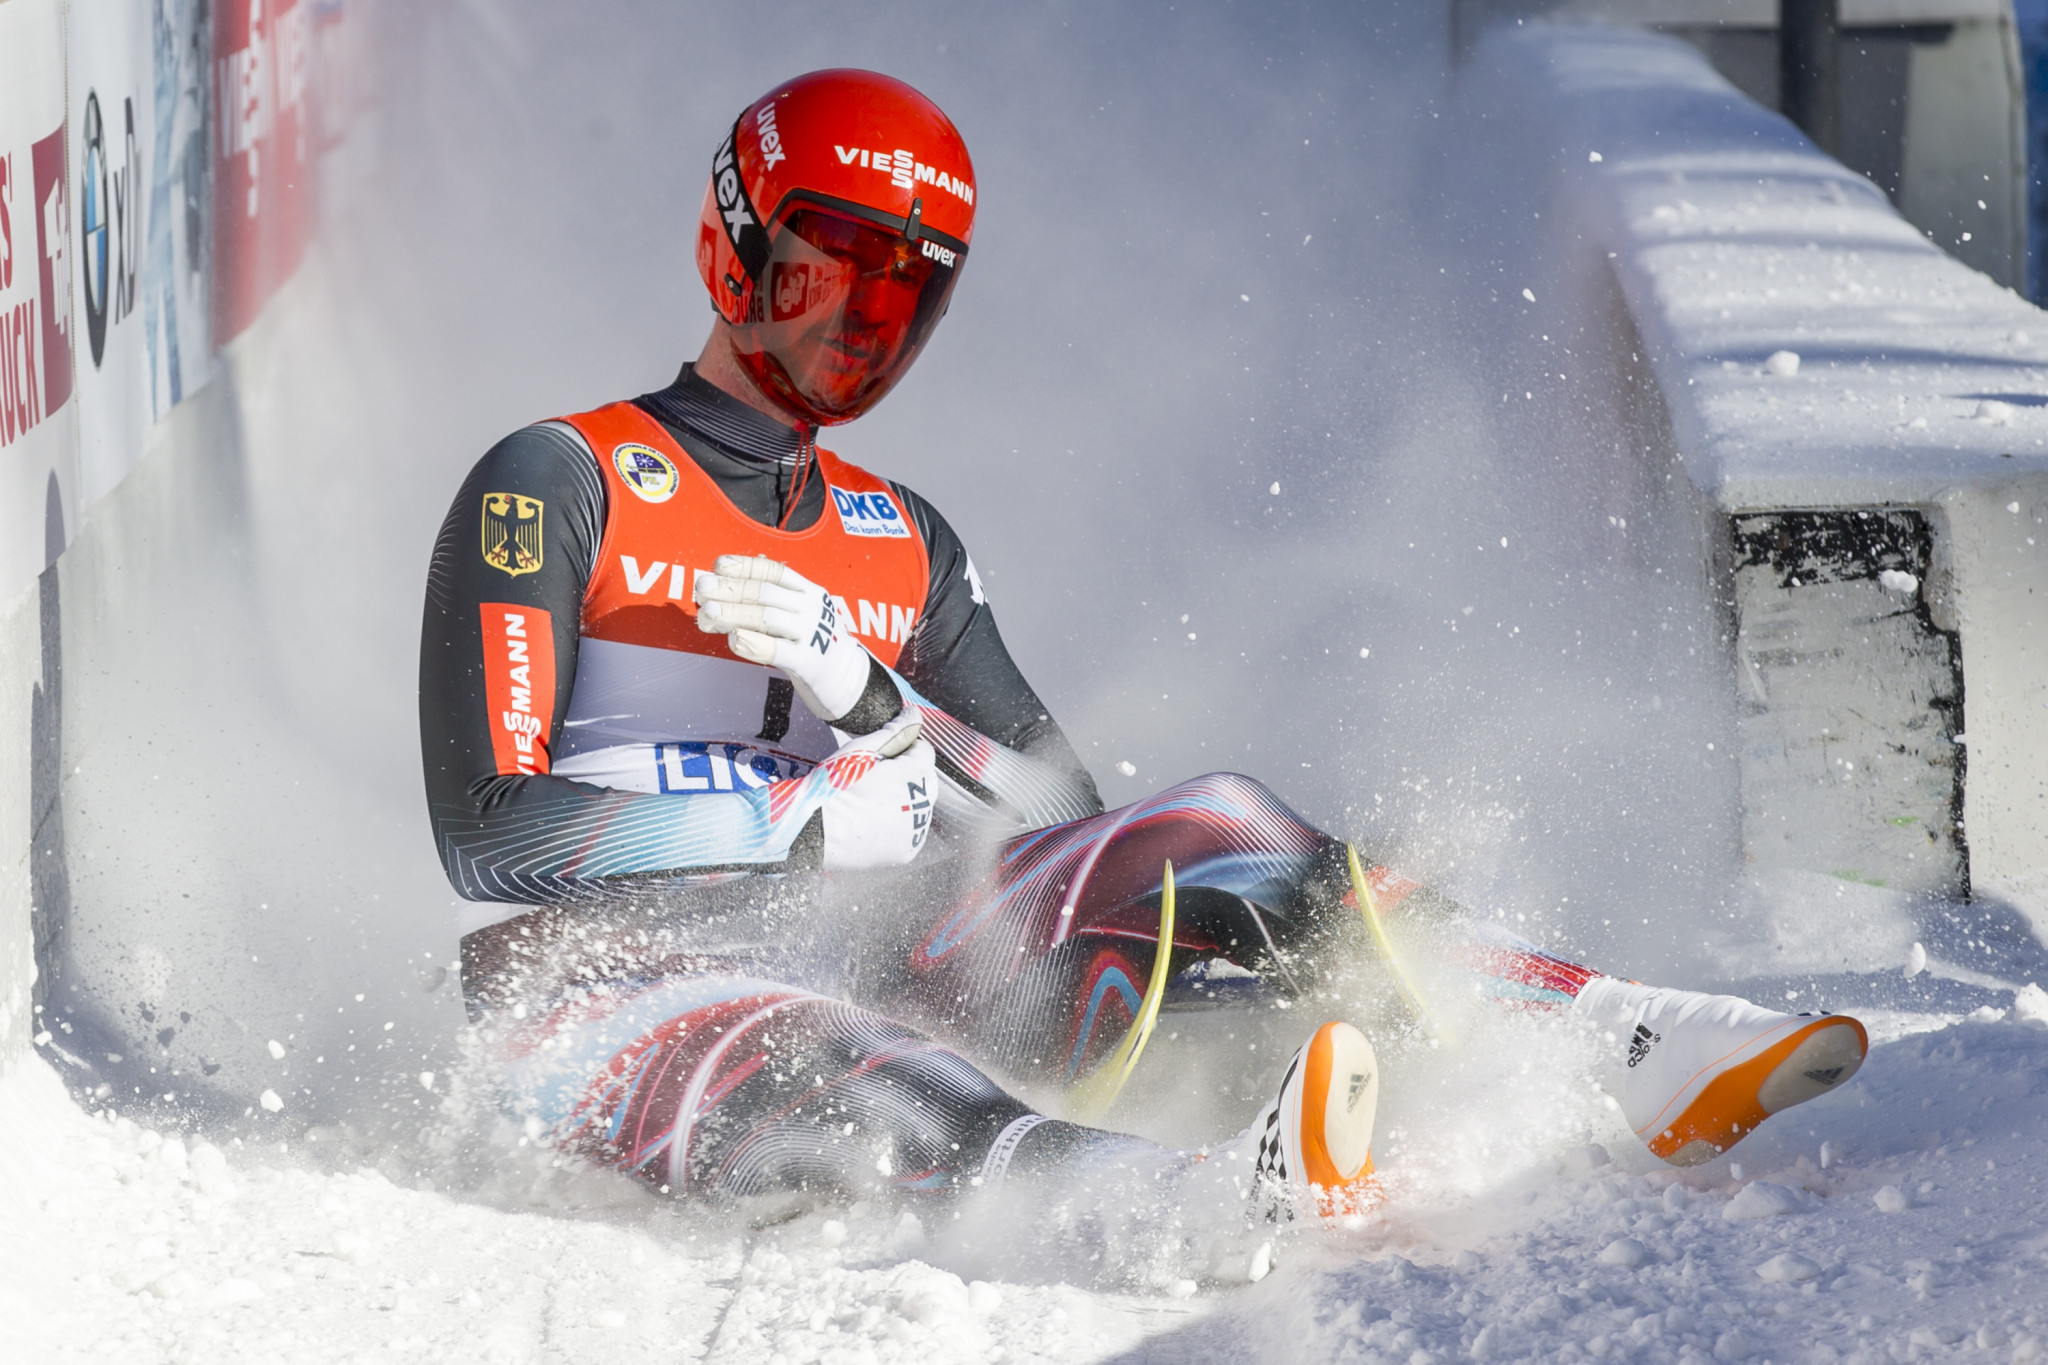 Ralf Palik won World Championship silver during his career ©Getty Images